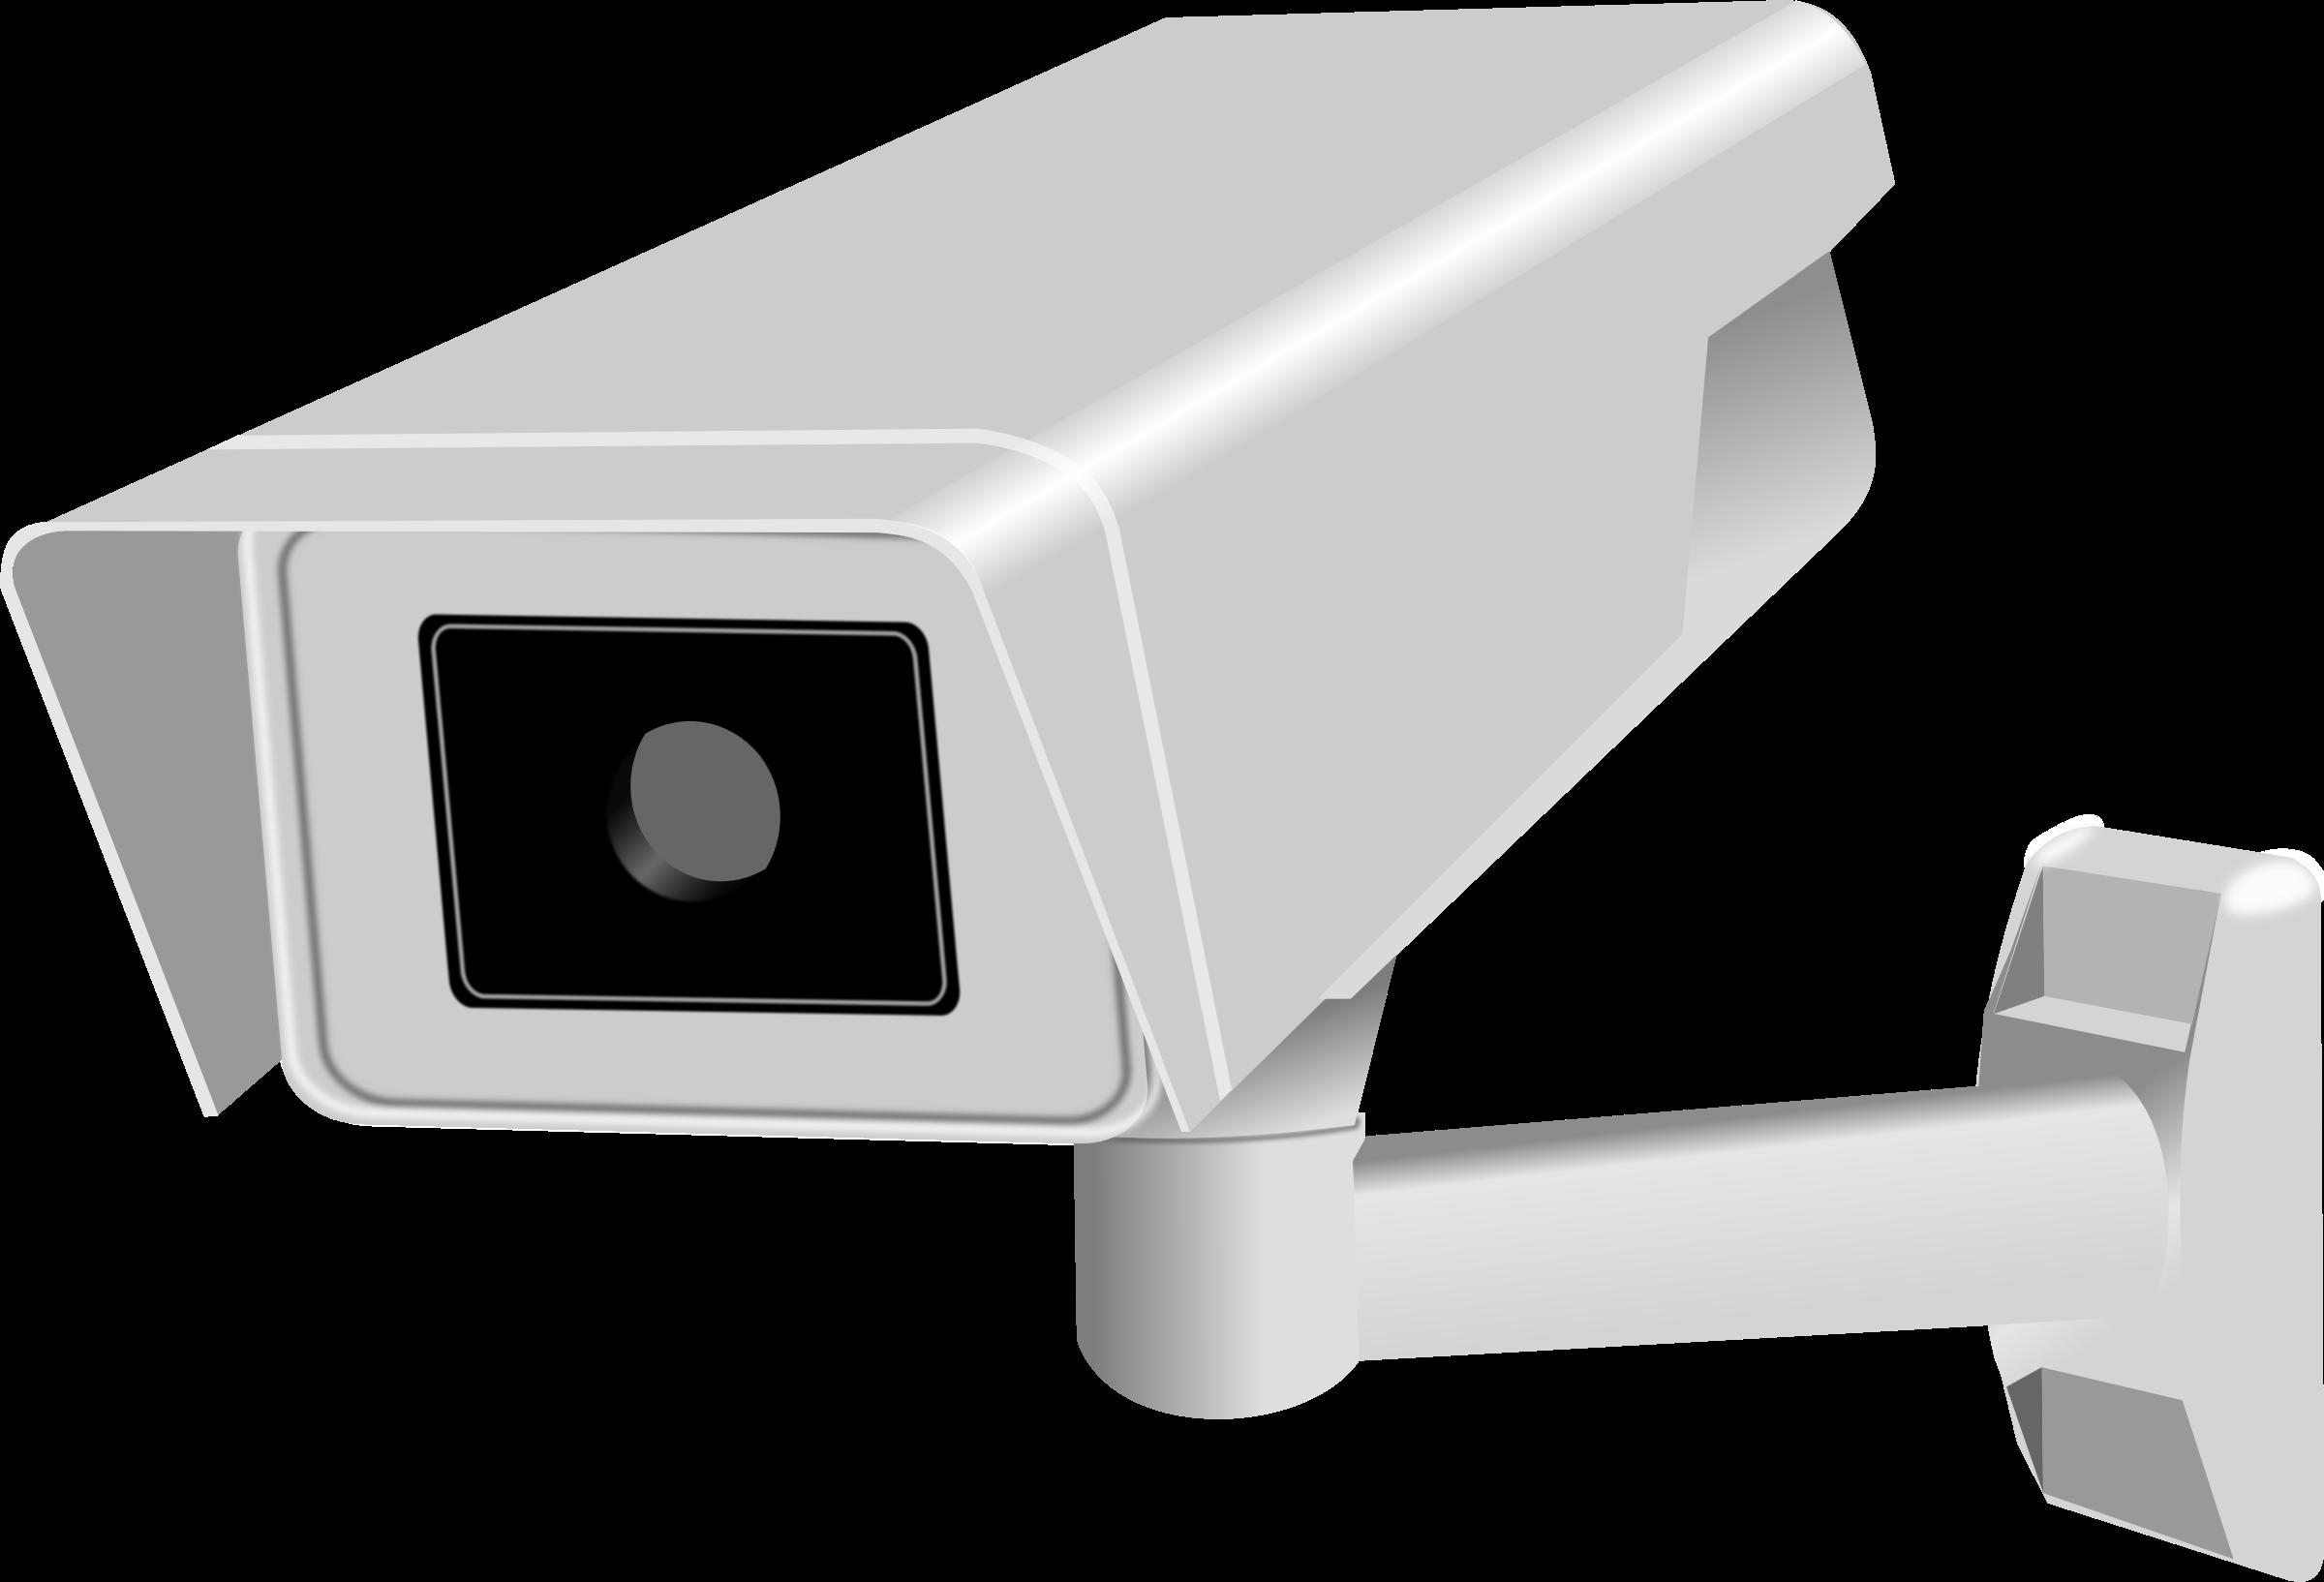 2400x1634 Security Camera Vector Art Image